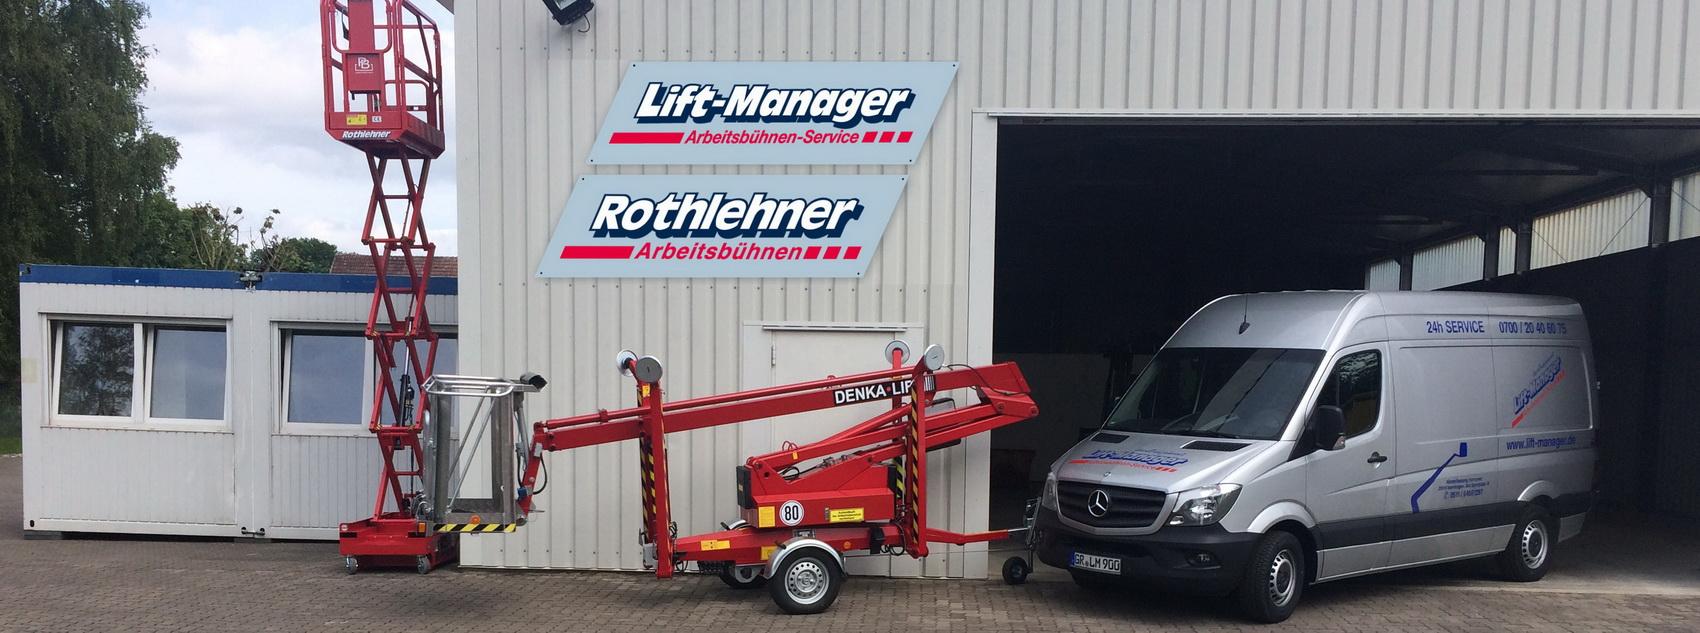 Lift-Manager Arbeitsbühnen Service - Hannover